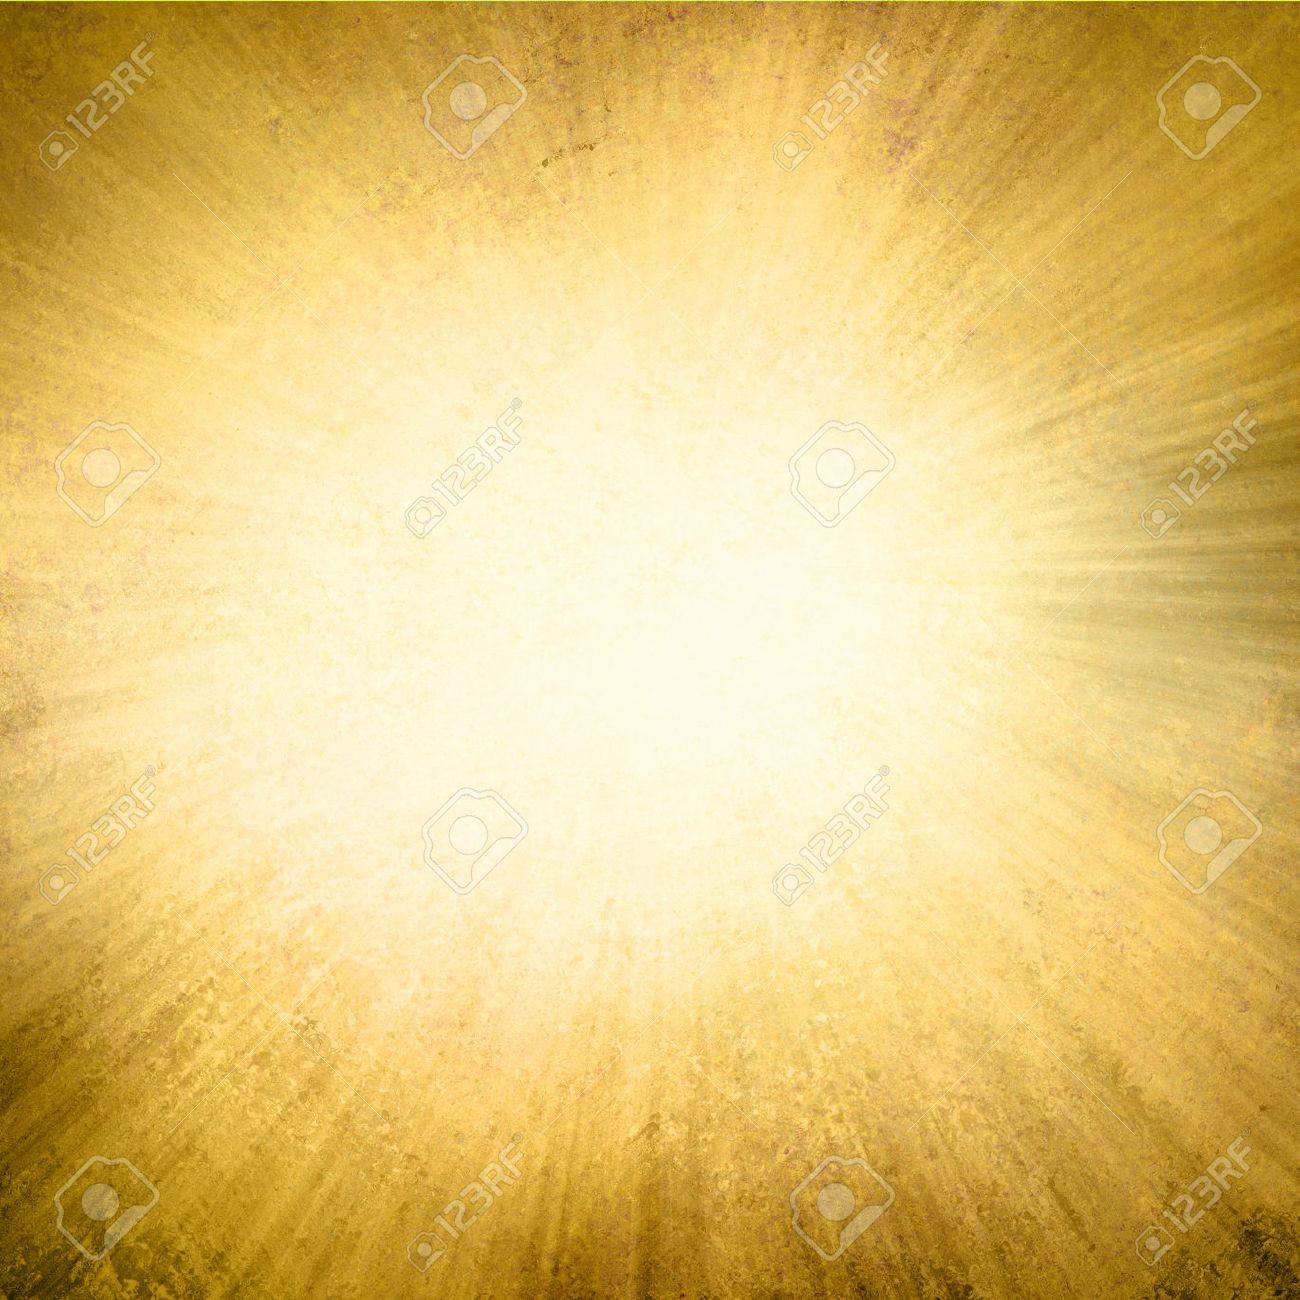 Background image center - Gold Background Yellow Streaks Of Light Radiate From Center To Dark Brown Frame In Sunburst